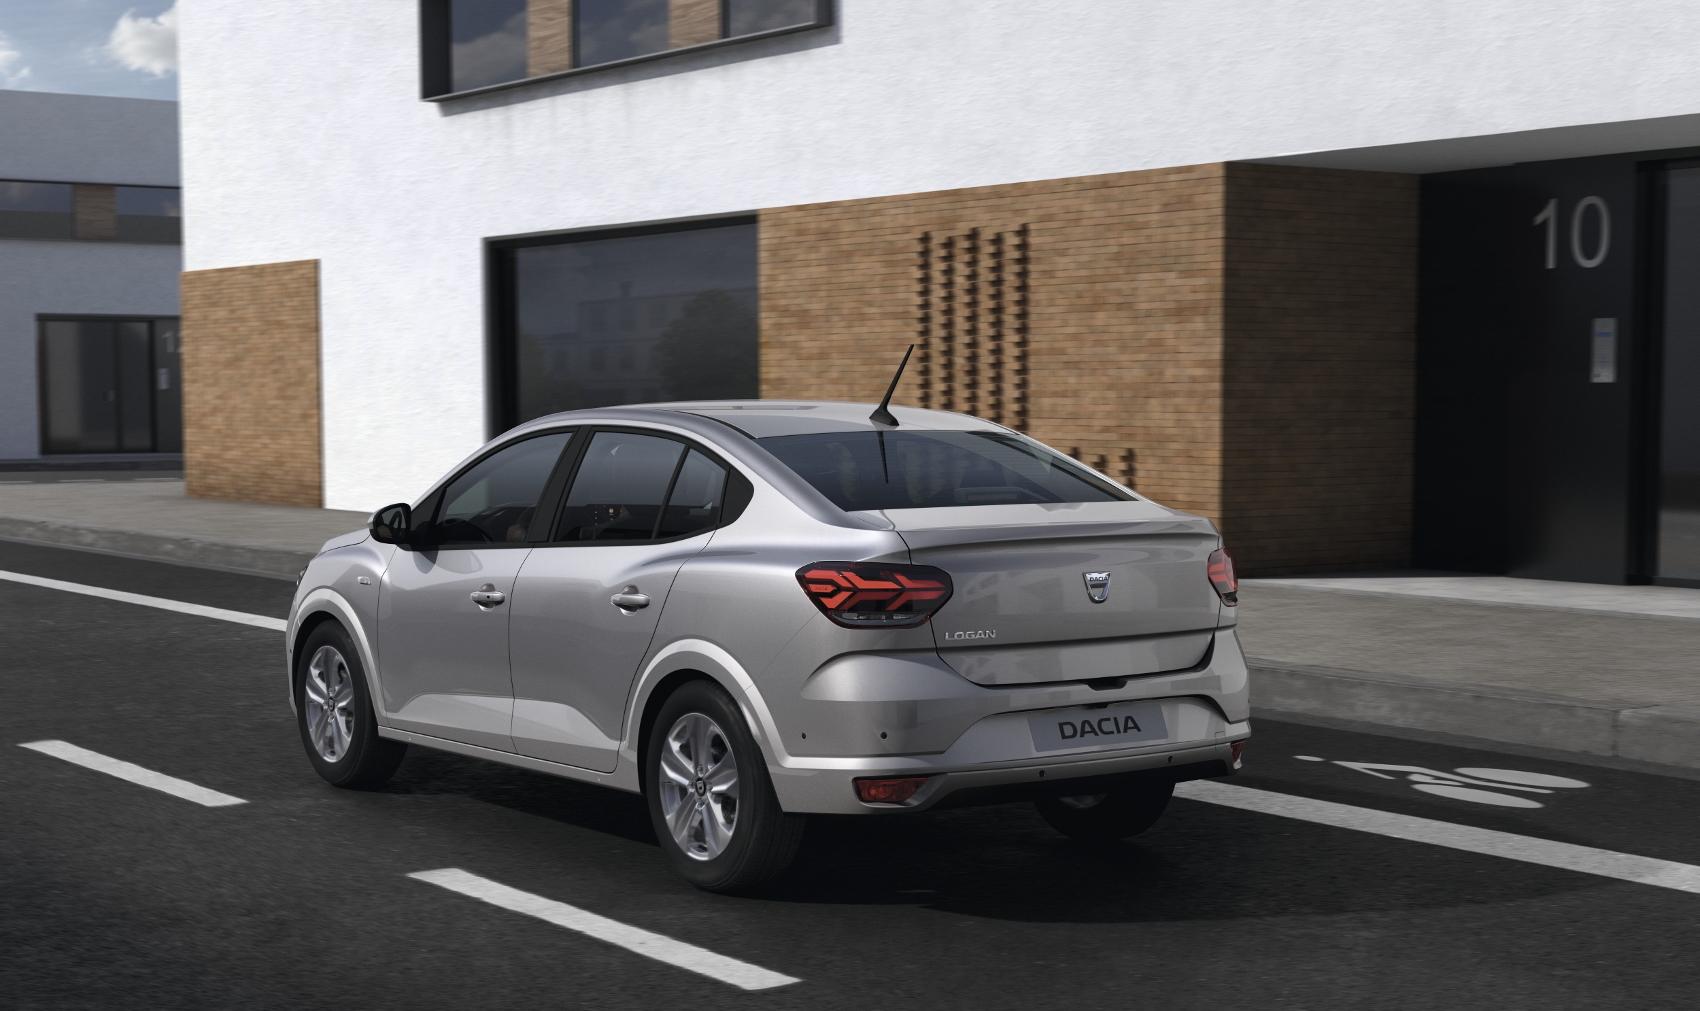 2020 - New Dacia LOGAN (1700x1011)